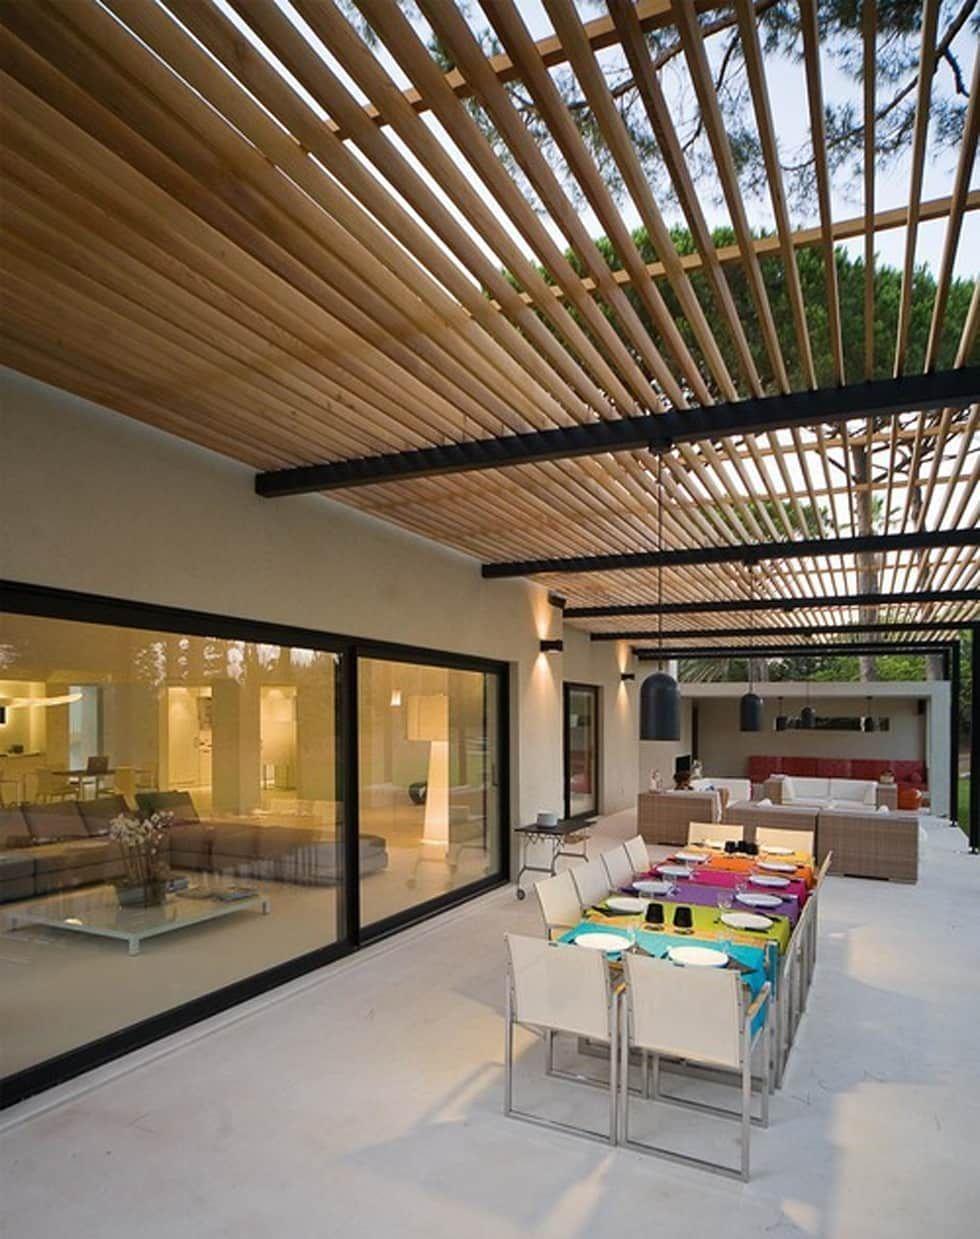 Style De Veranda Moderne modern wp balcony, veranda & terrace housevincent coste